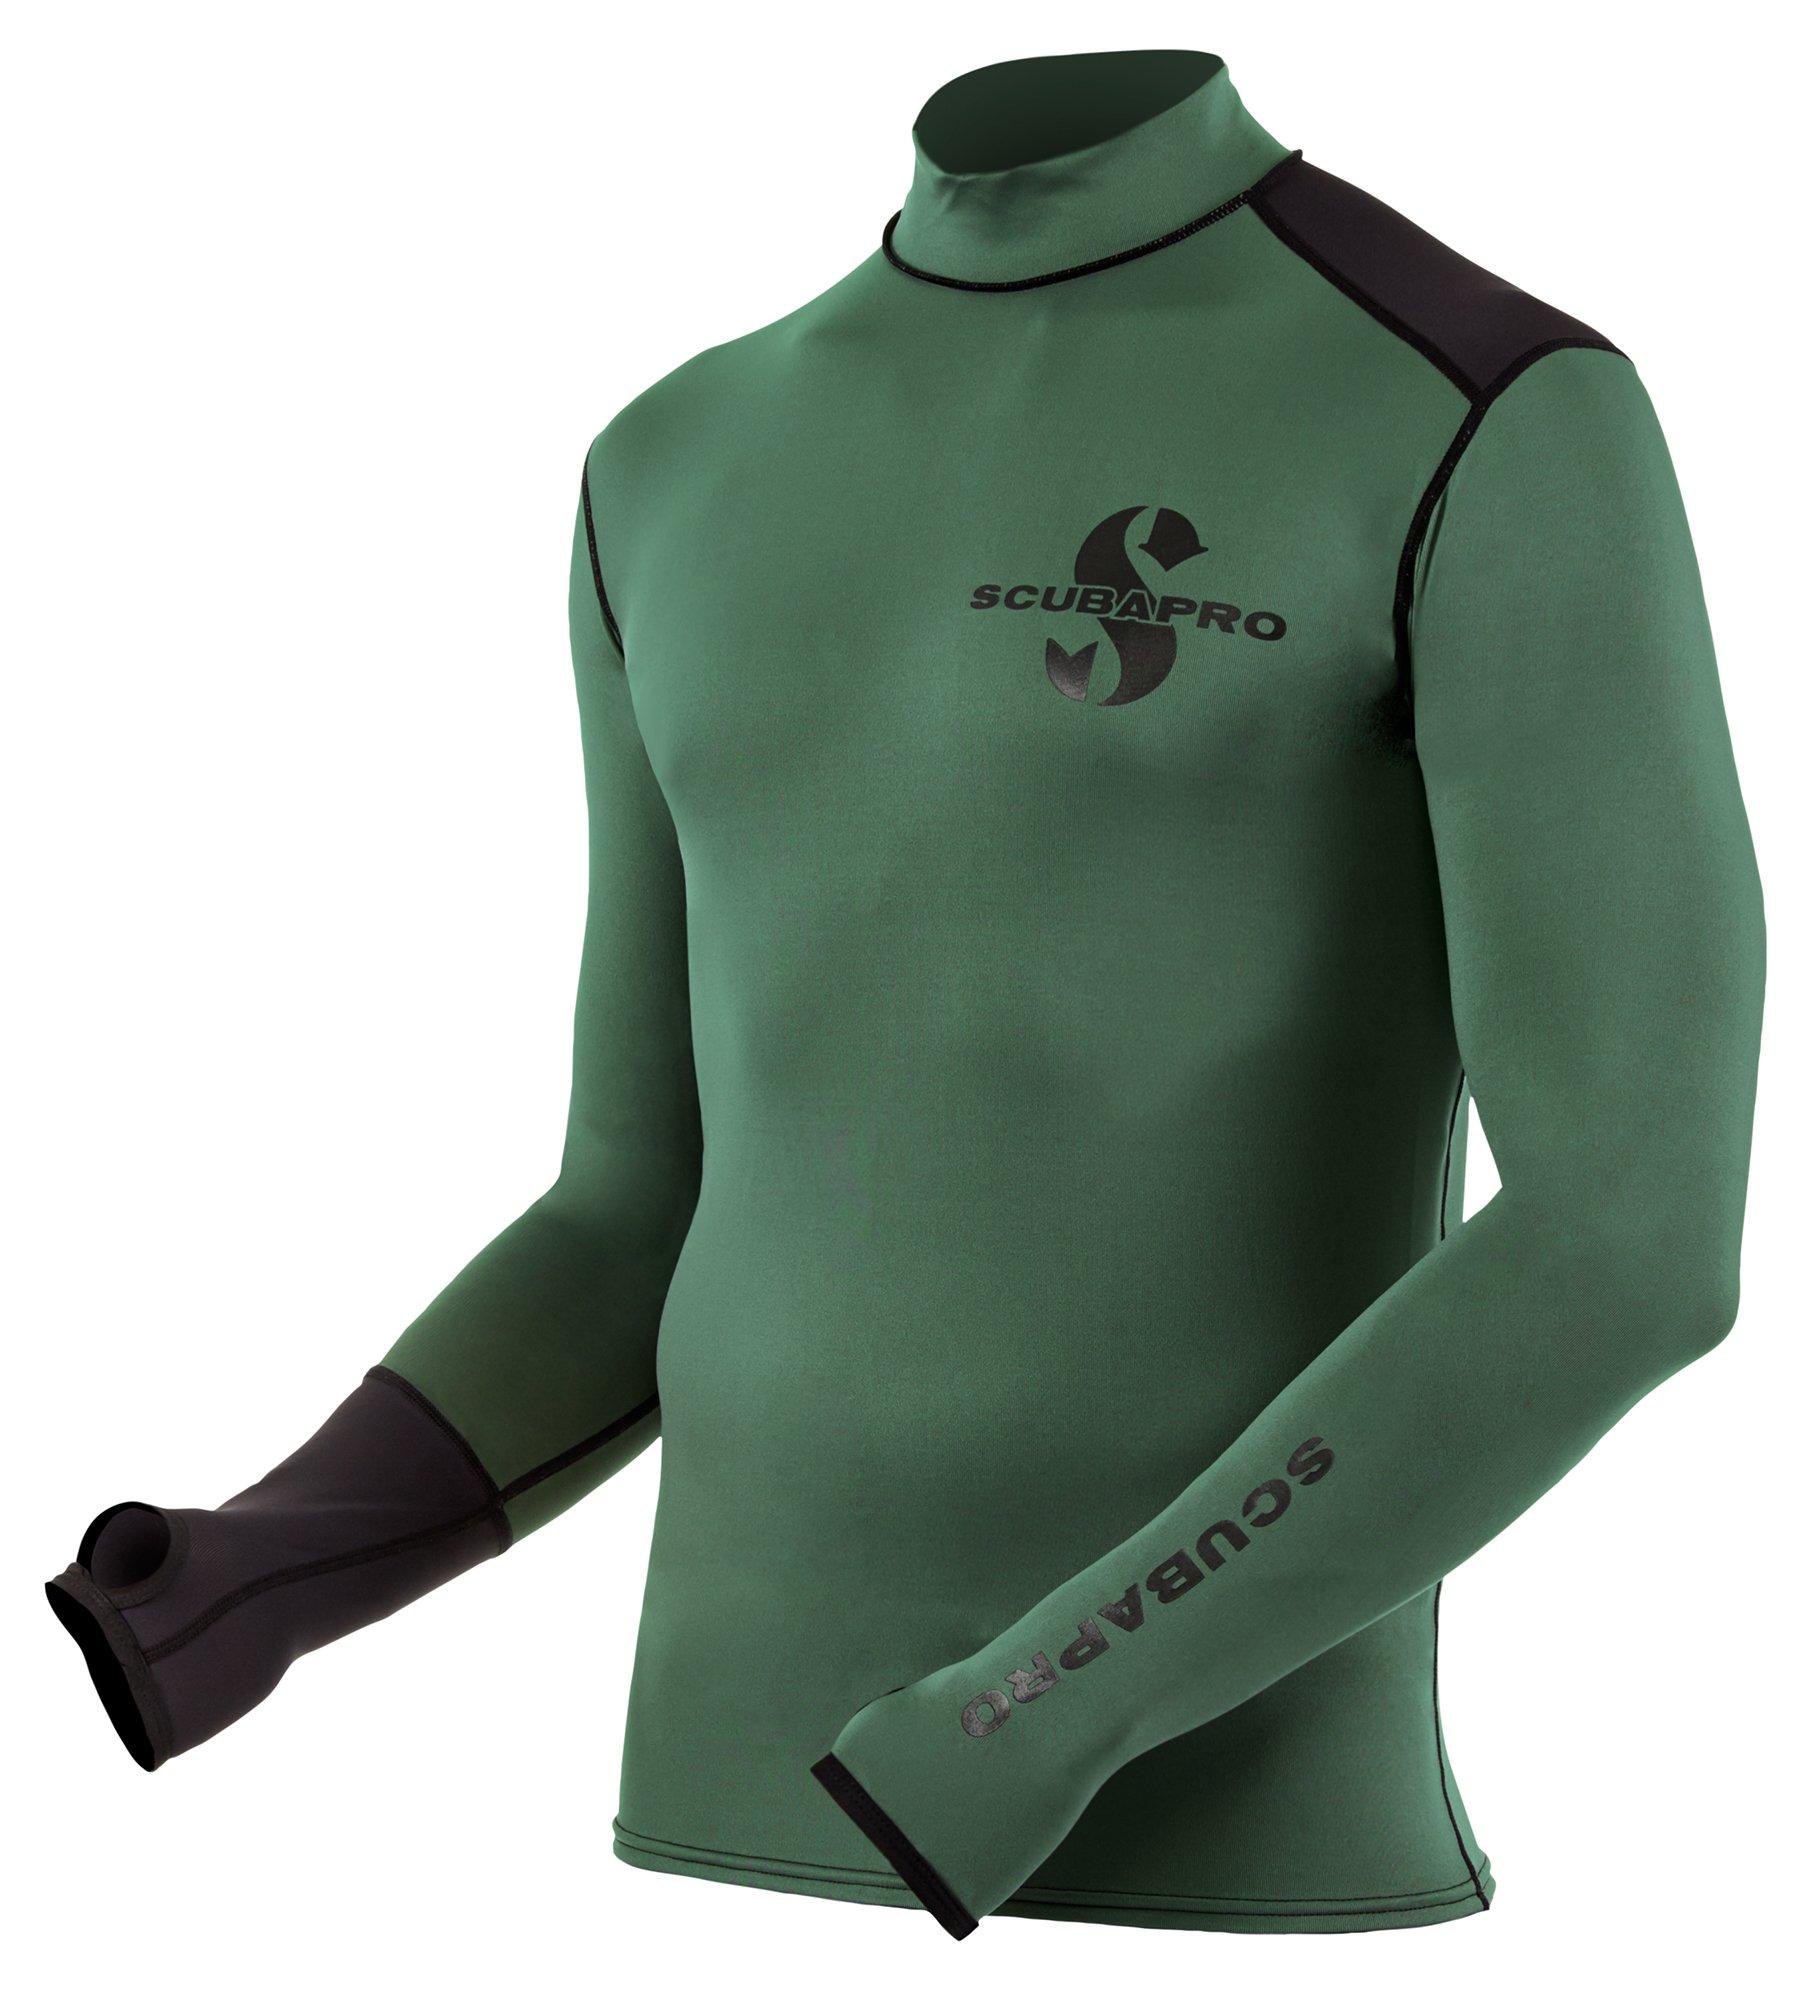 Scubapro Men's Eco Long Sleeve Rash Guard (Army Green, X-Large)